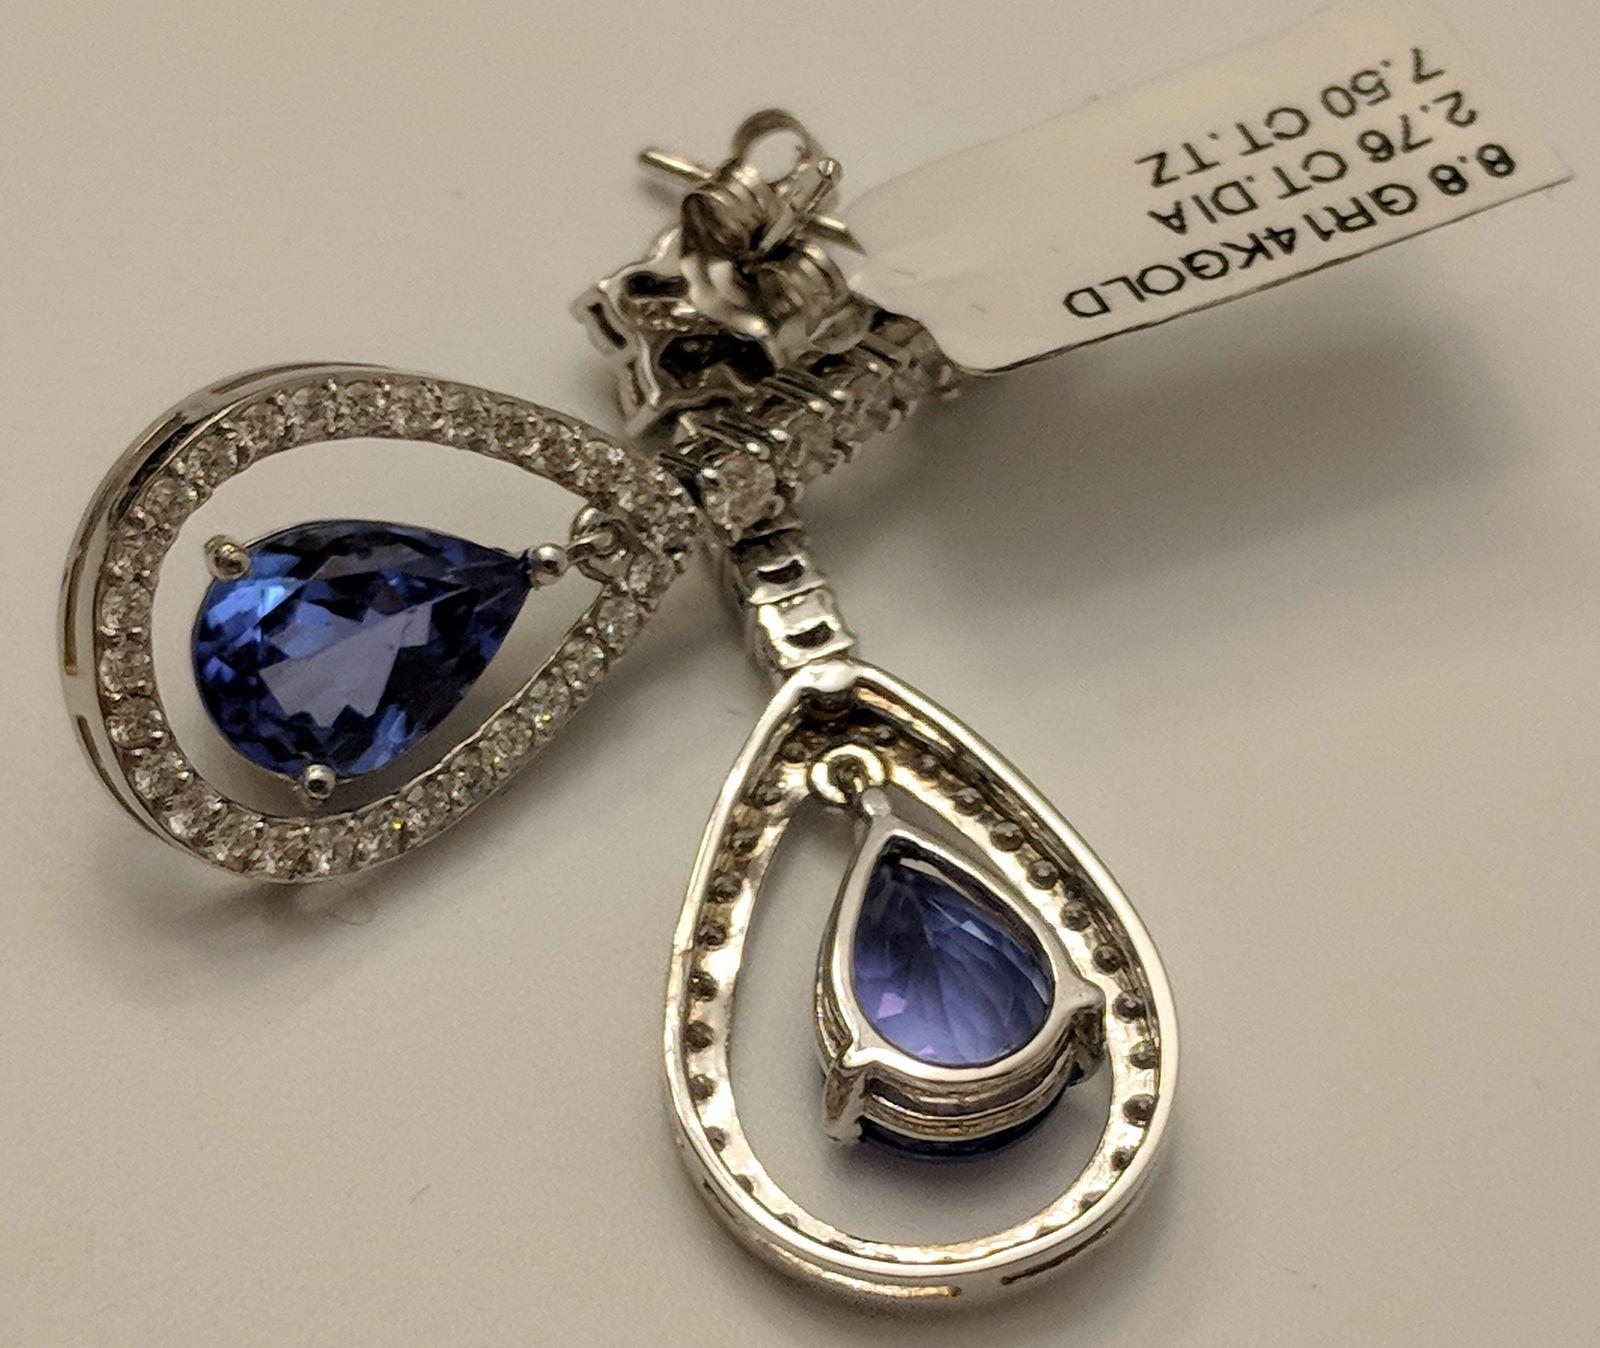 Ruby or Tanzanite & Diamond Earrings, 14K Gold!  2.75cts of Dazzling Diamonds an